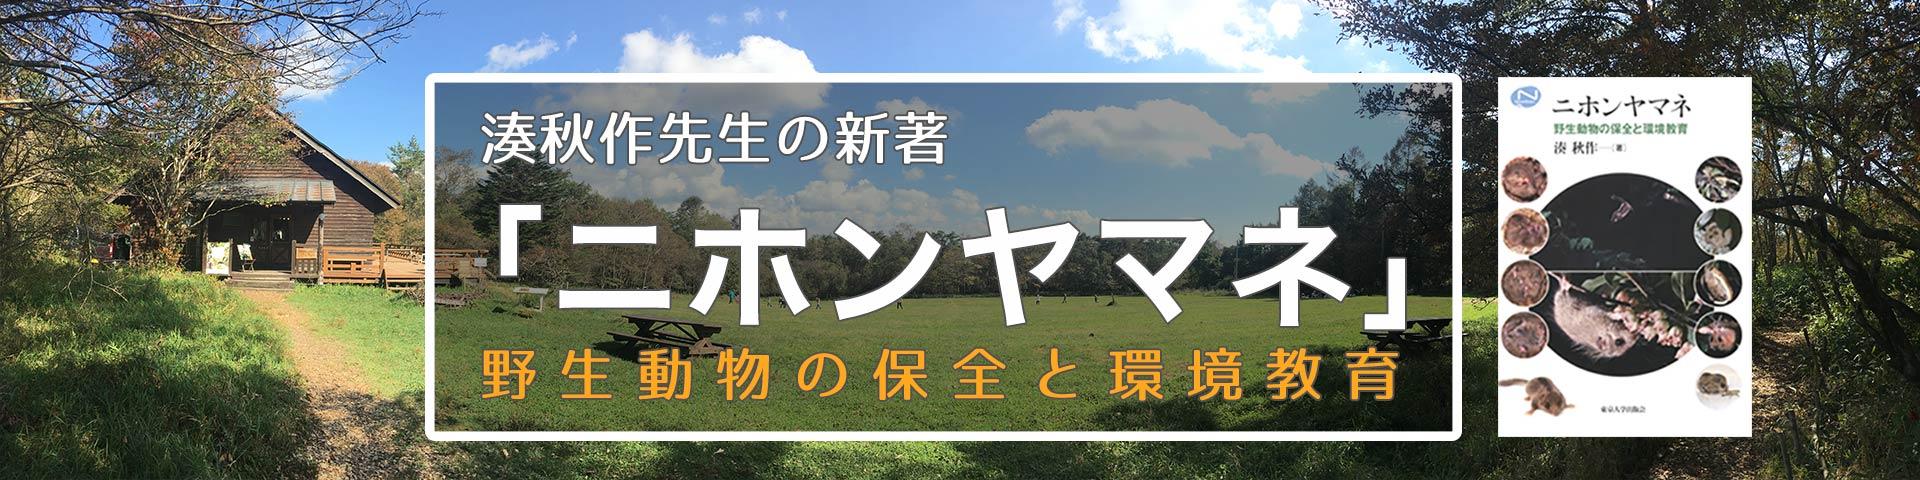 Animal-pathway & Wildlife Association